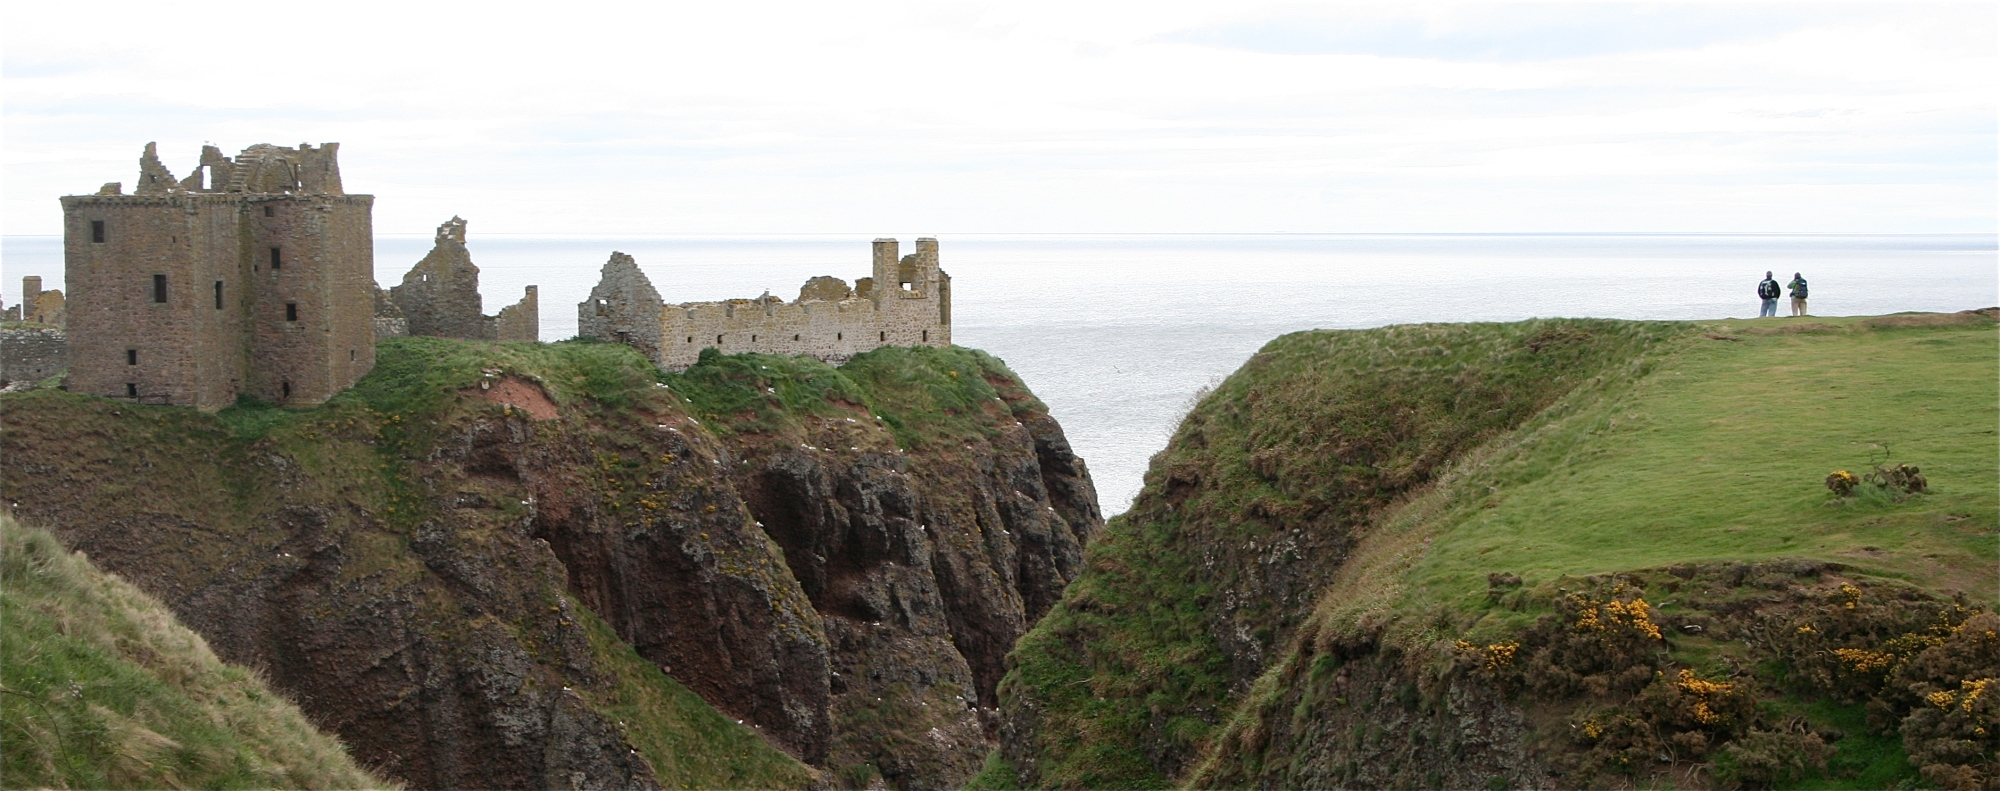 Dunnottar Castle, Dunnotar Castle, Scottish Castles, Dunnottar Castle Scotland